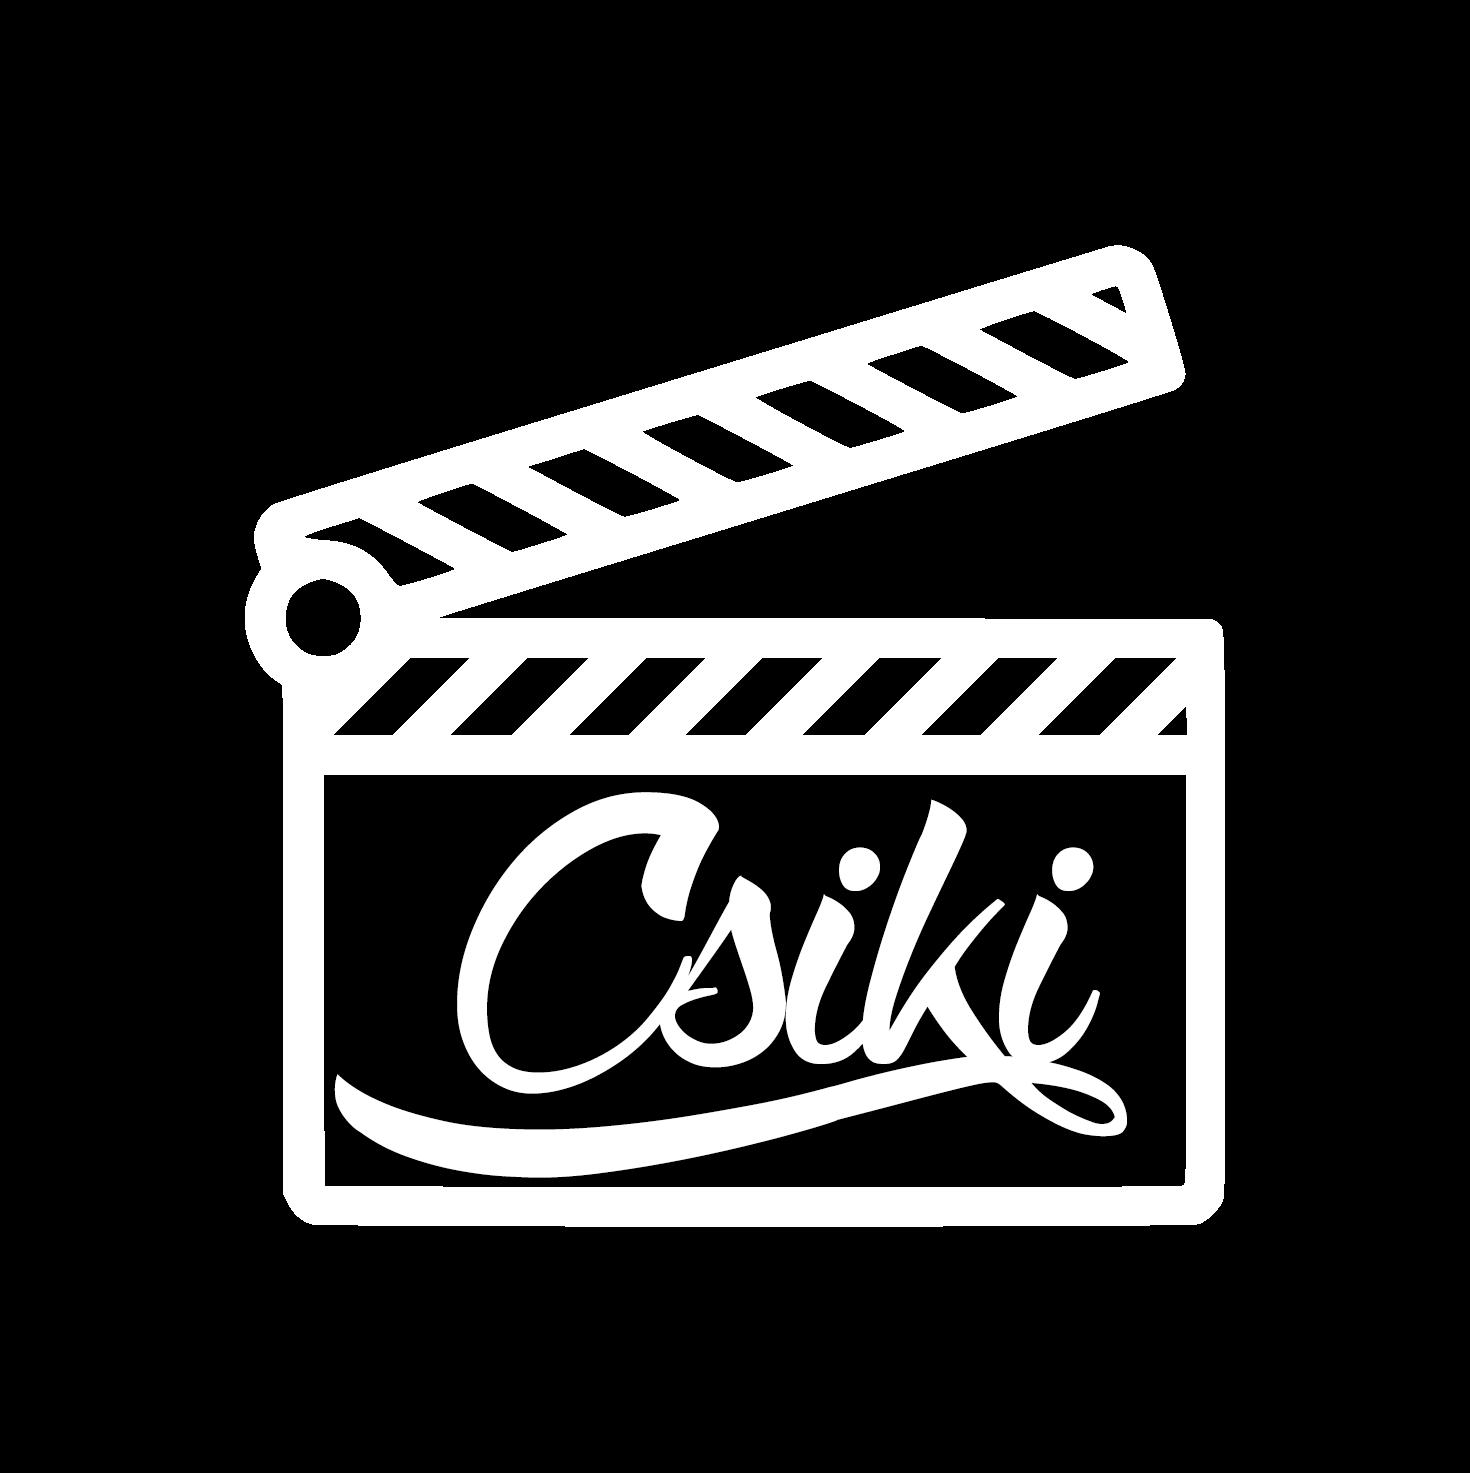 Csiki Film esküvői videó logó